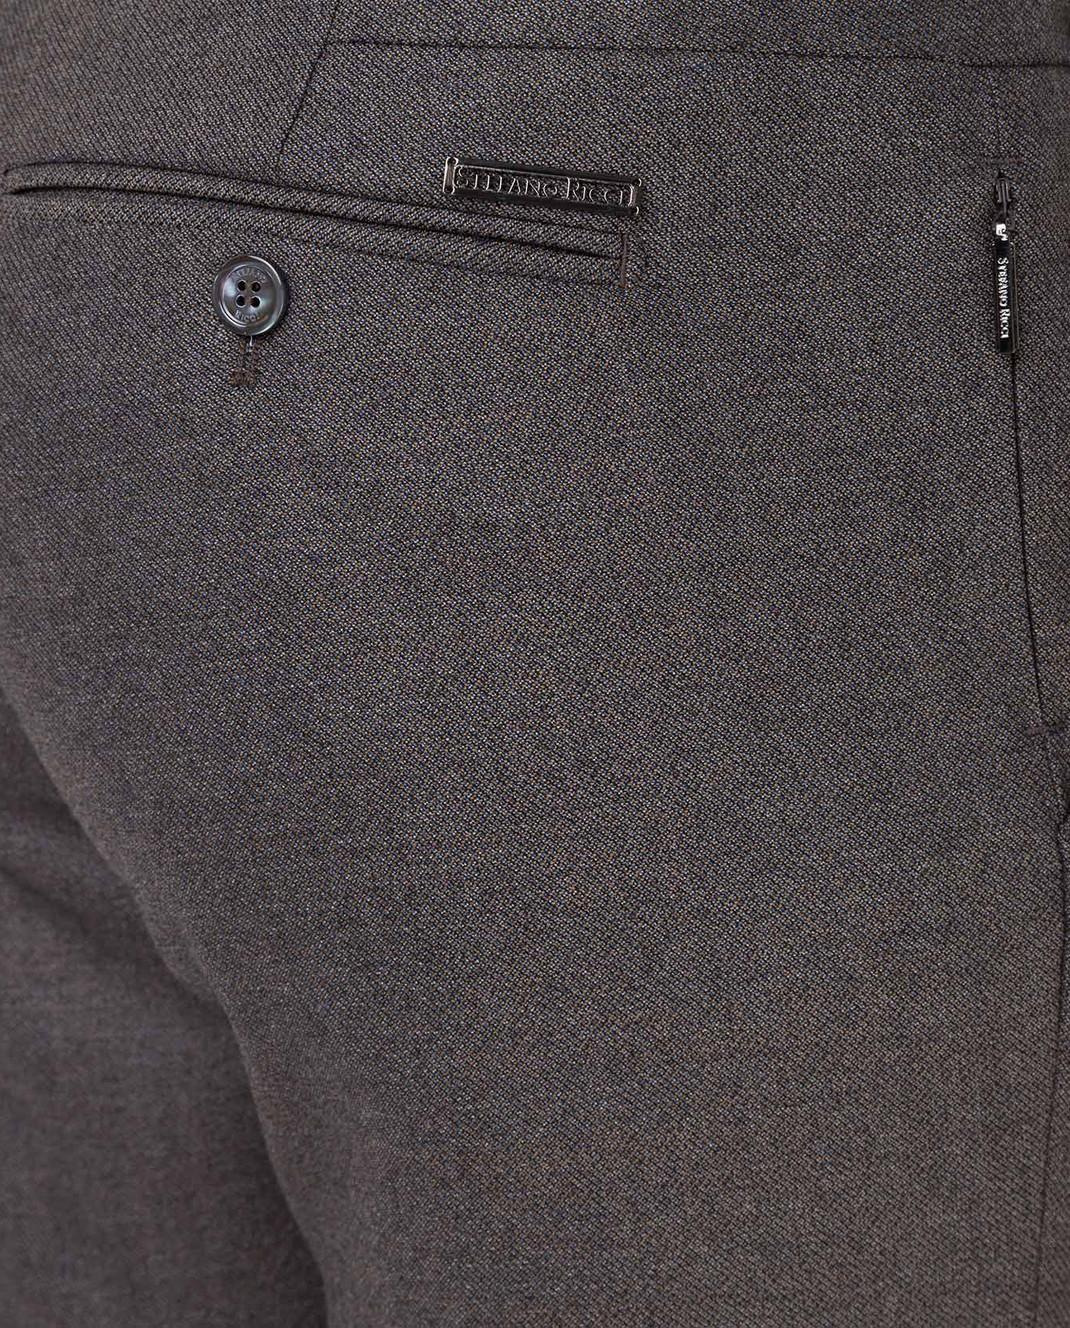 Stefano Ricci Темно-бежевые брюки из шерсти изображение 5